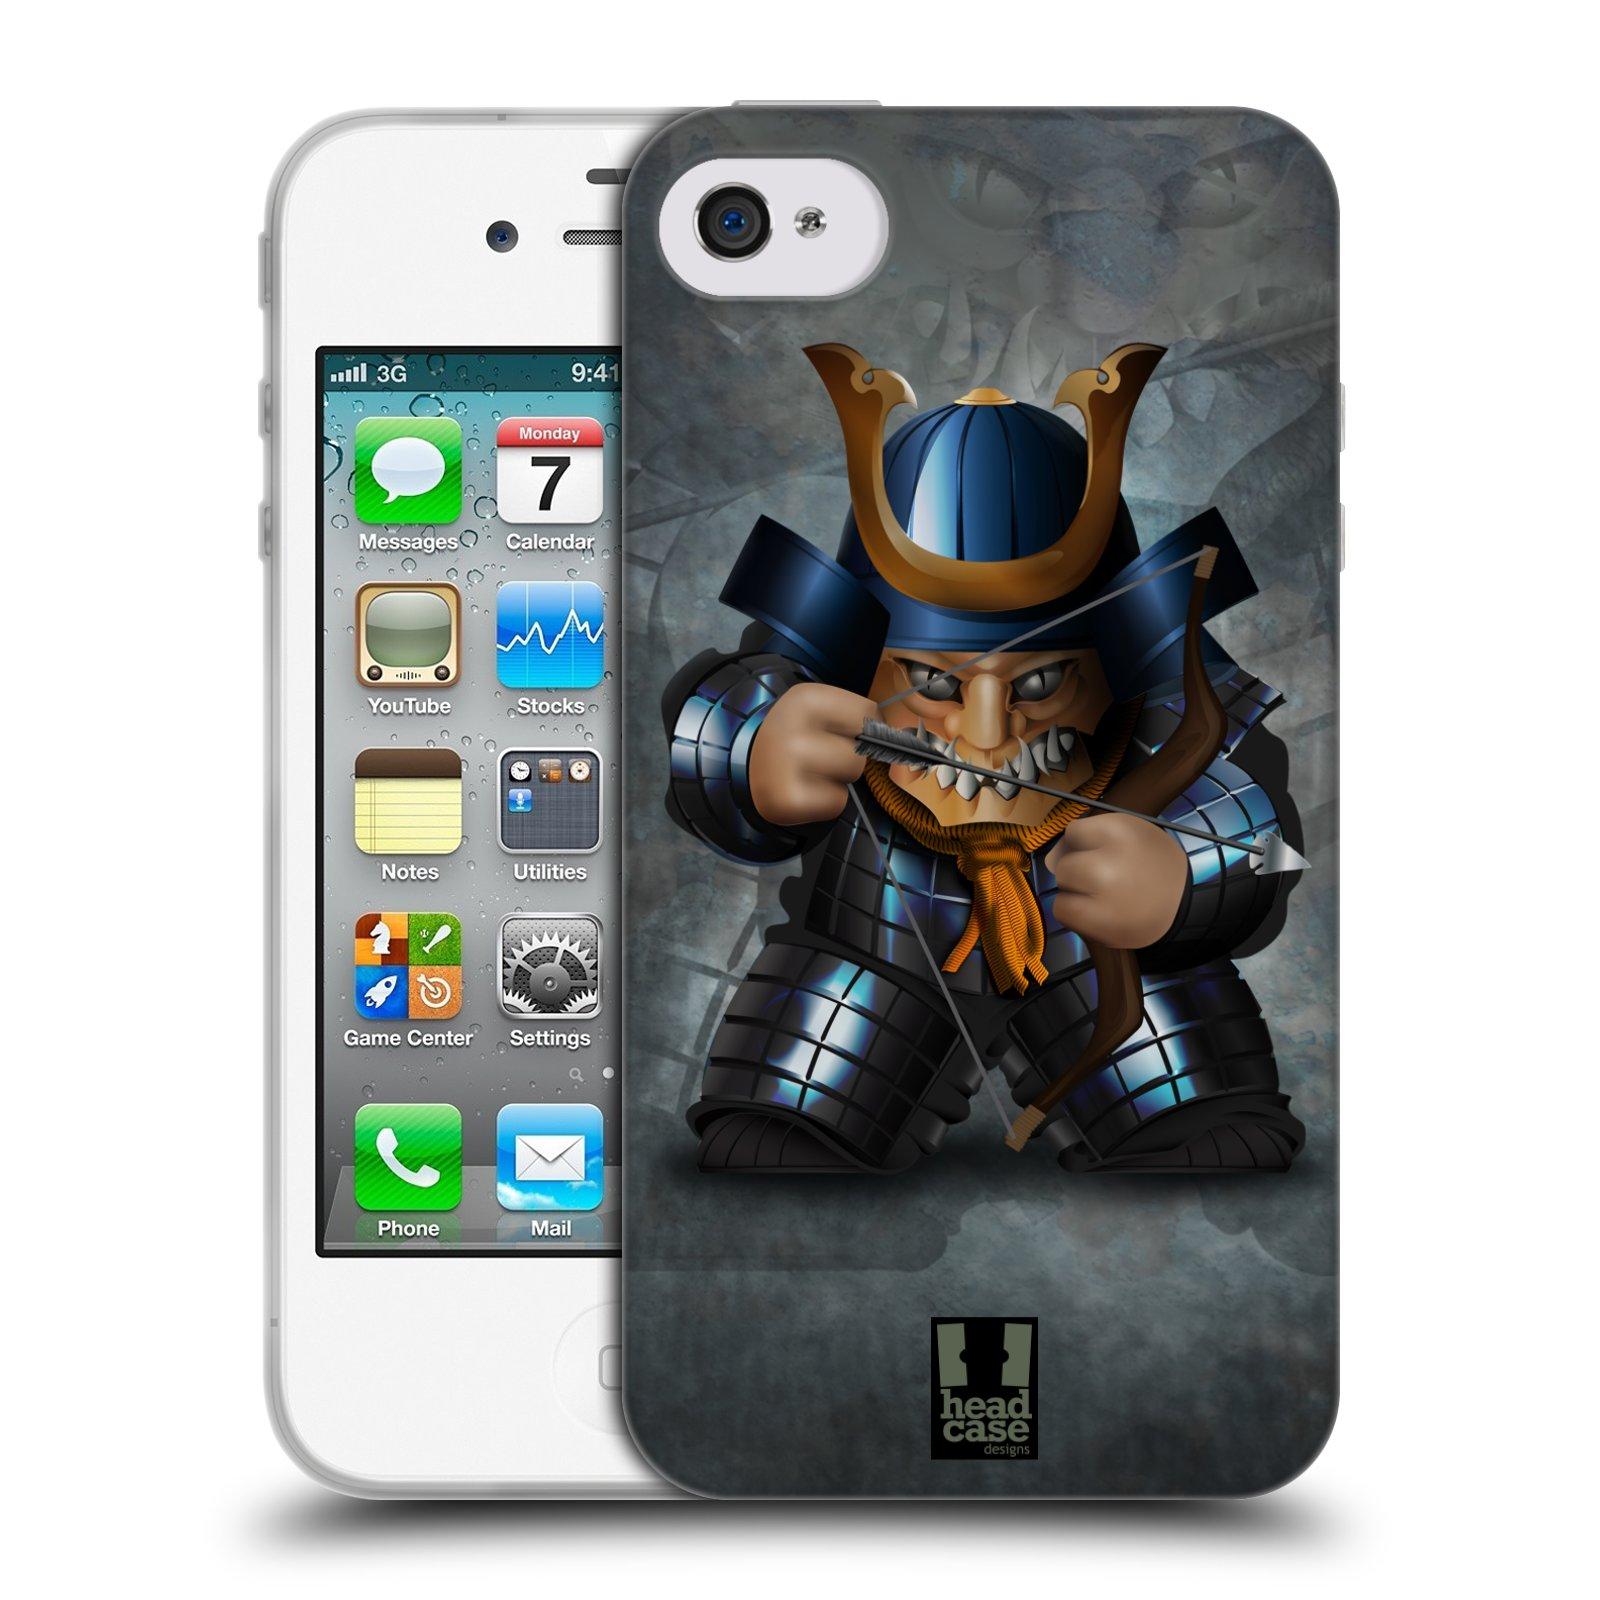 HEAD CASE silikonový obal na mobil Apple Iphone 4/4S vzor Malí bojovníci SHOGUN STŘELEC